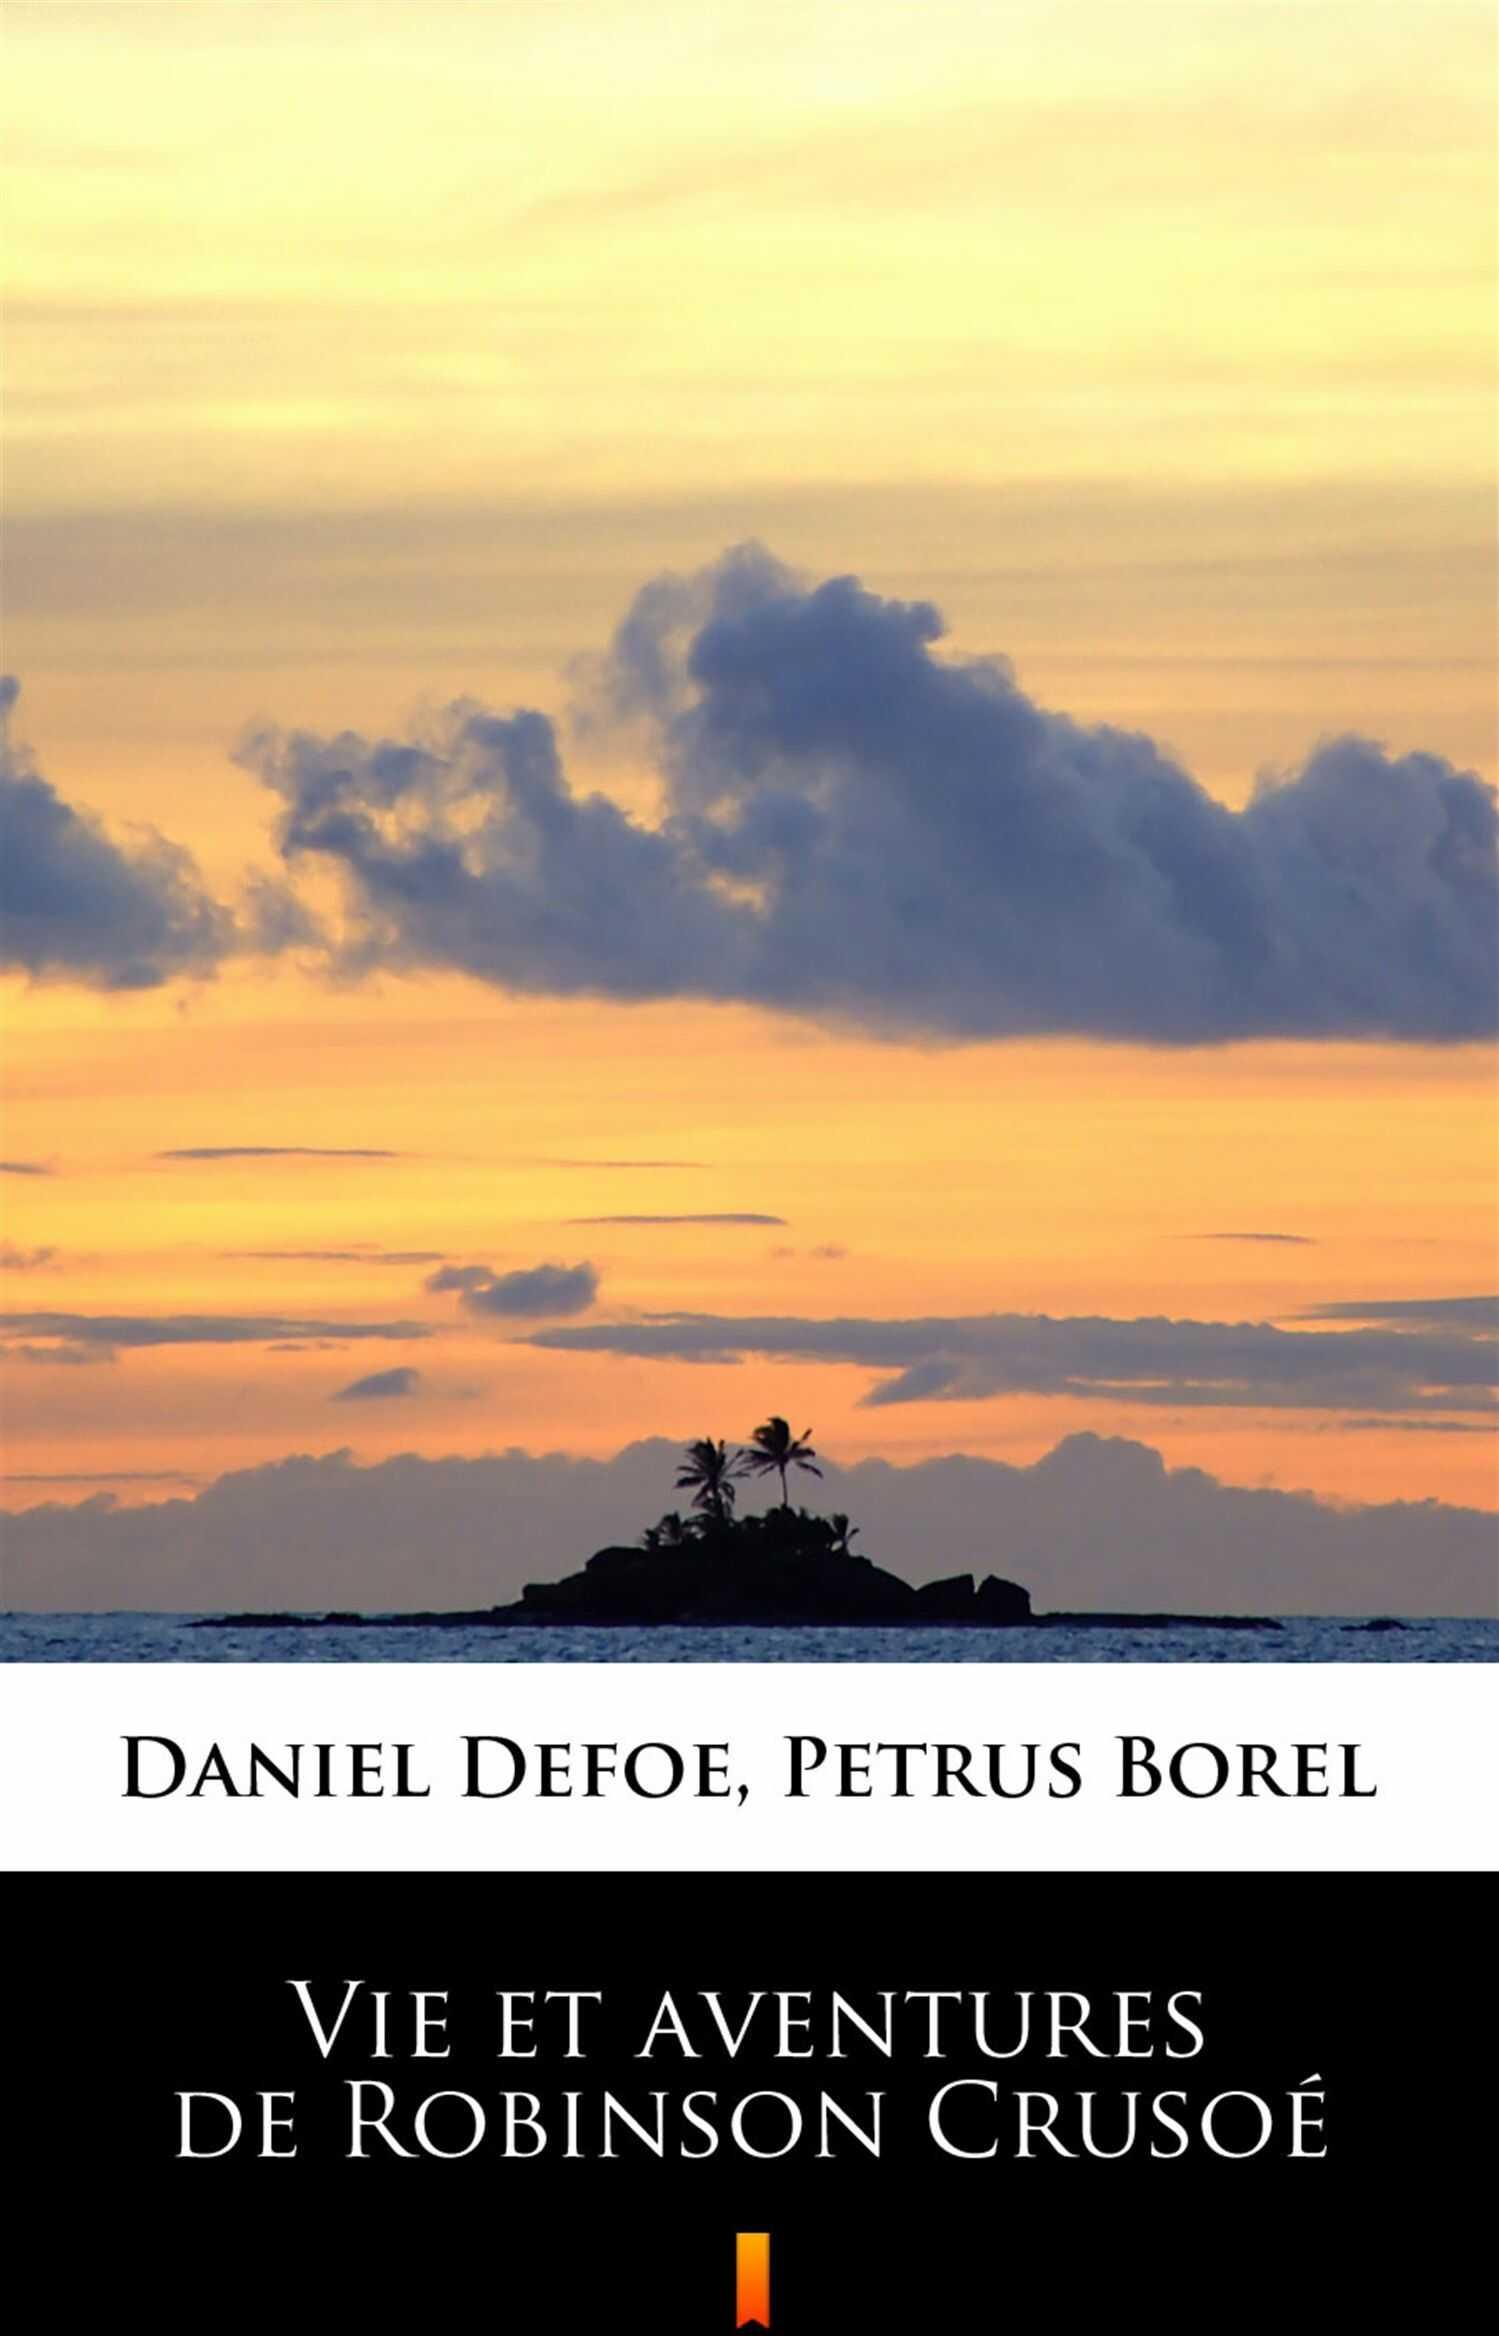 Vie et aventures de Robinson Crusoé - Daniel Defoe - ebook